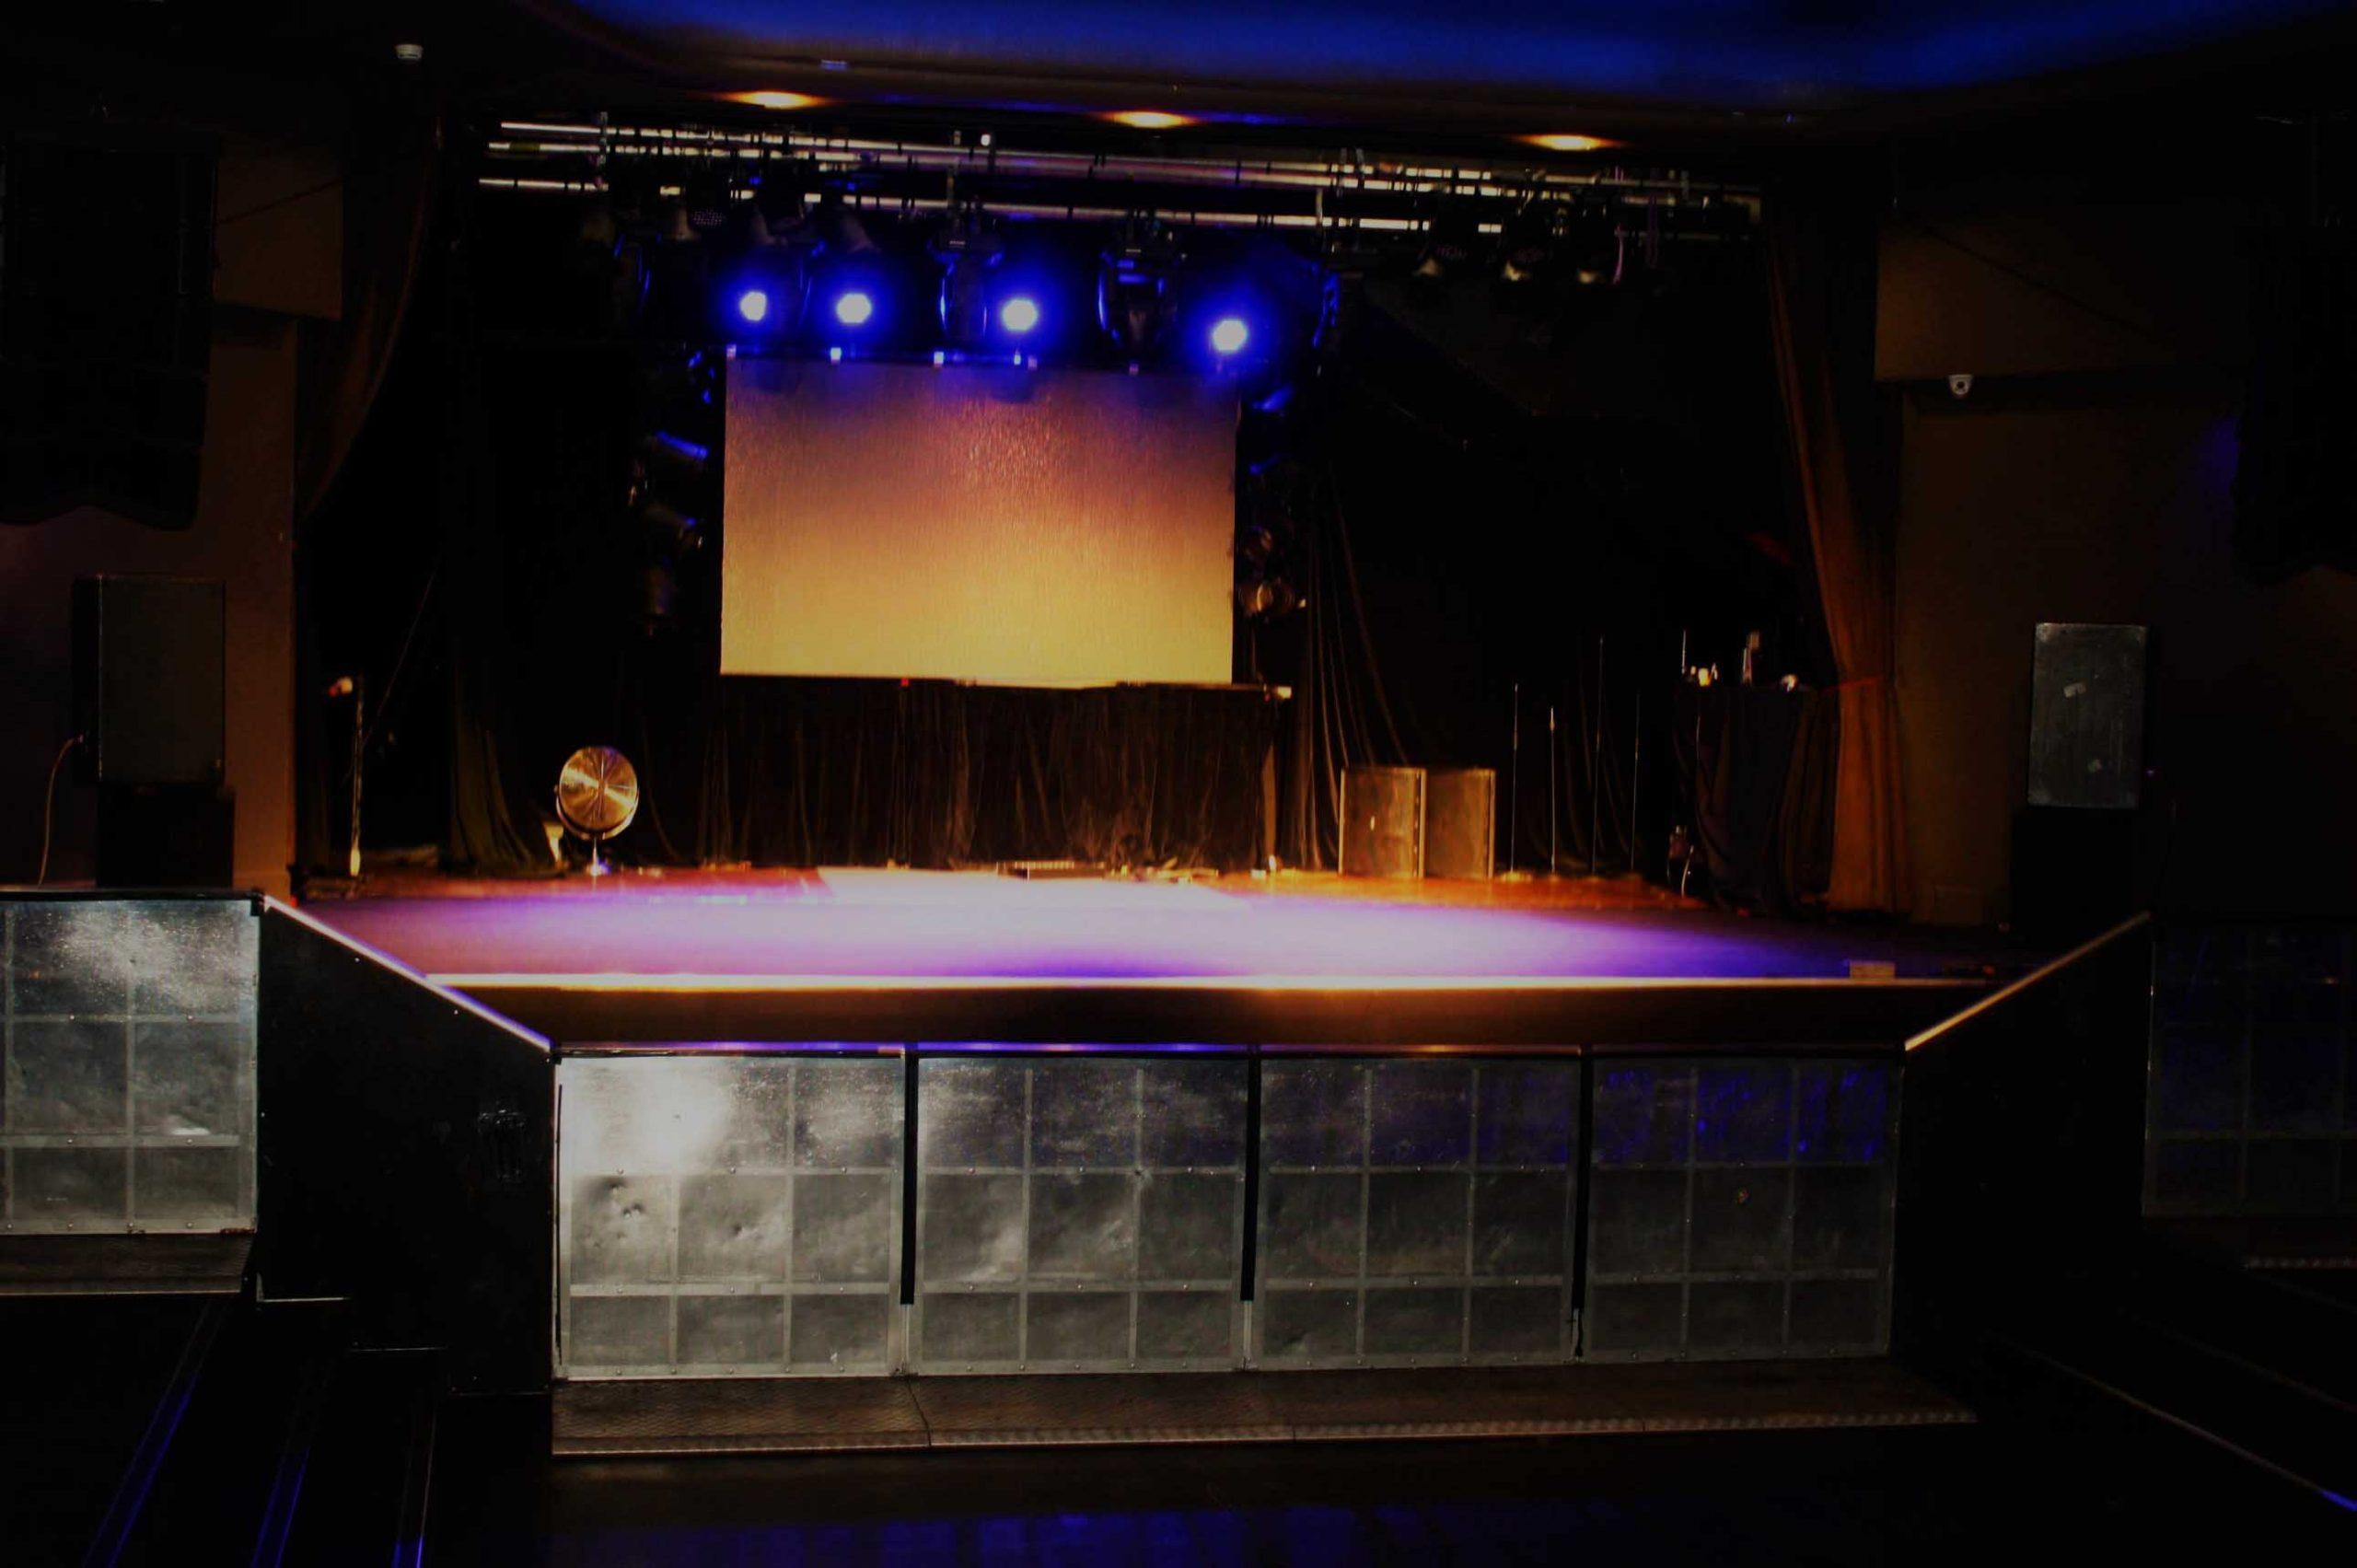 Max Watt's <br/> Live Music Venues